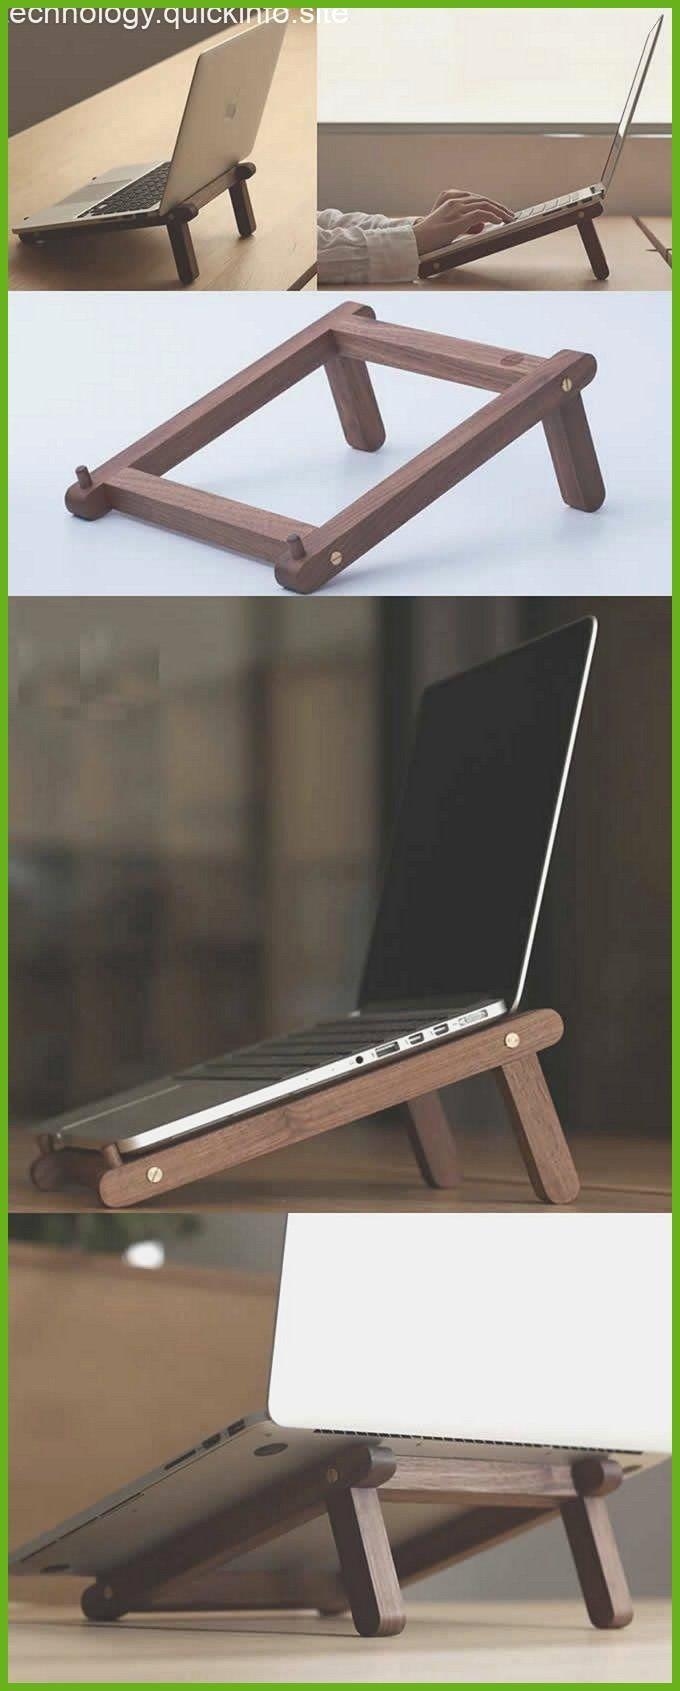 Universal Macbook Laptop Cooling Ständer Konsole 11-15.6 ...